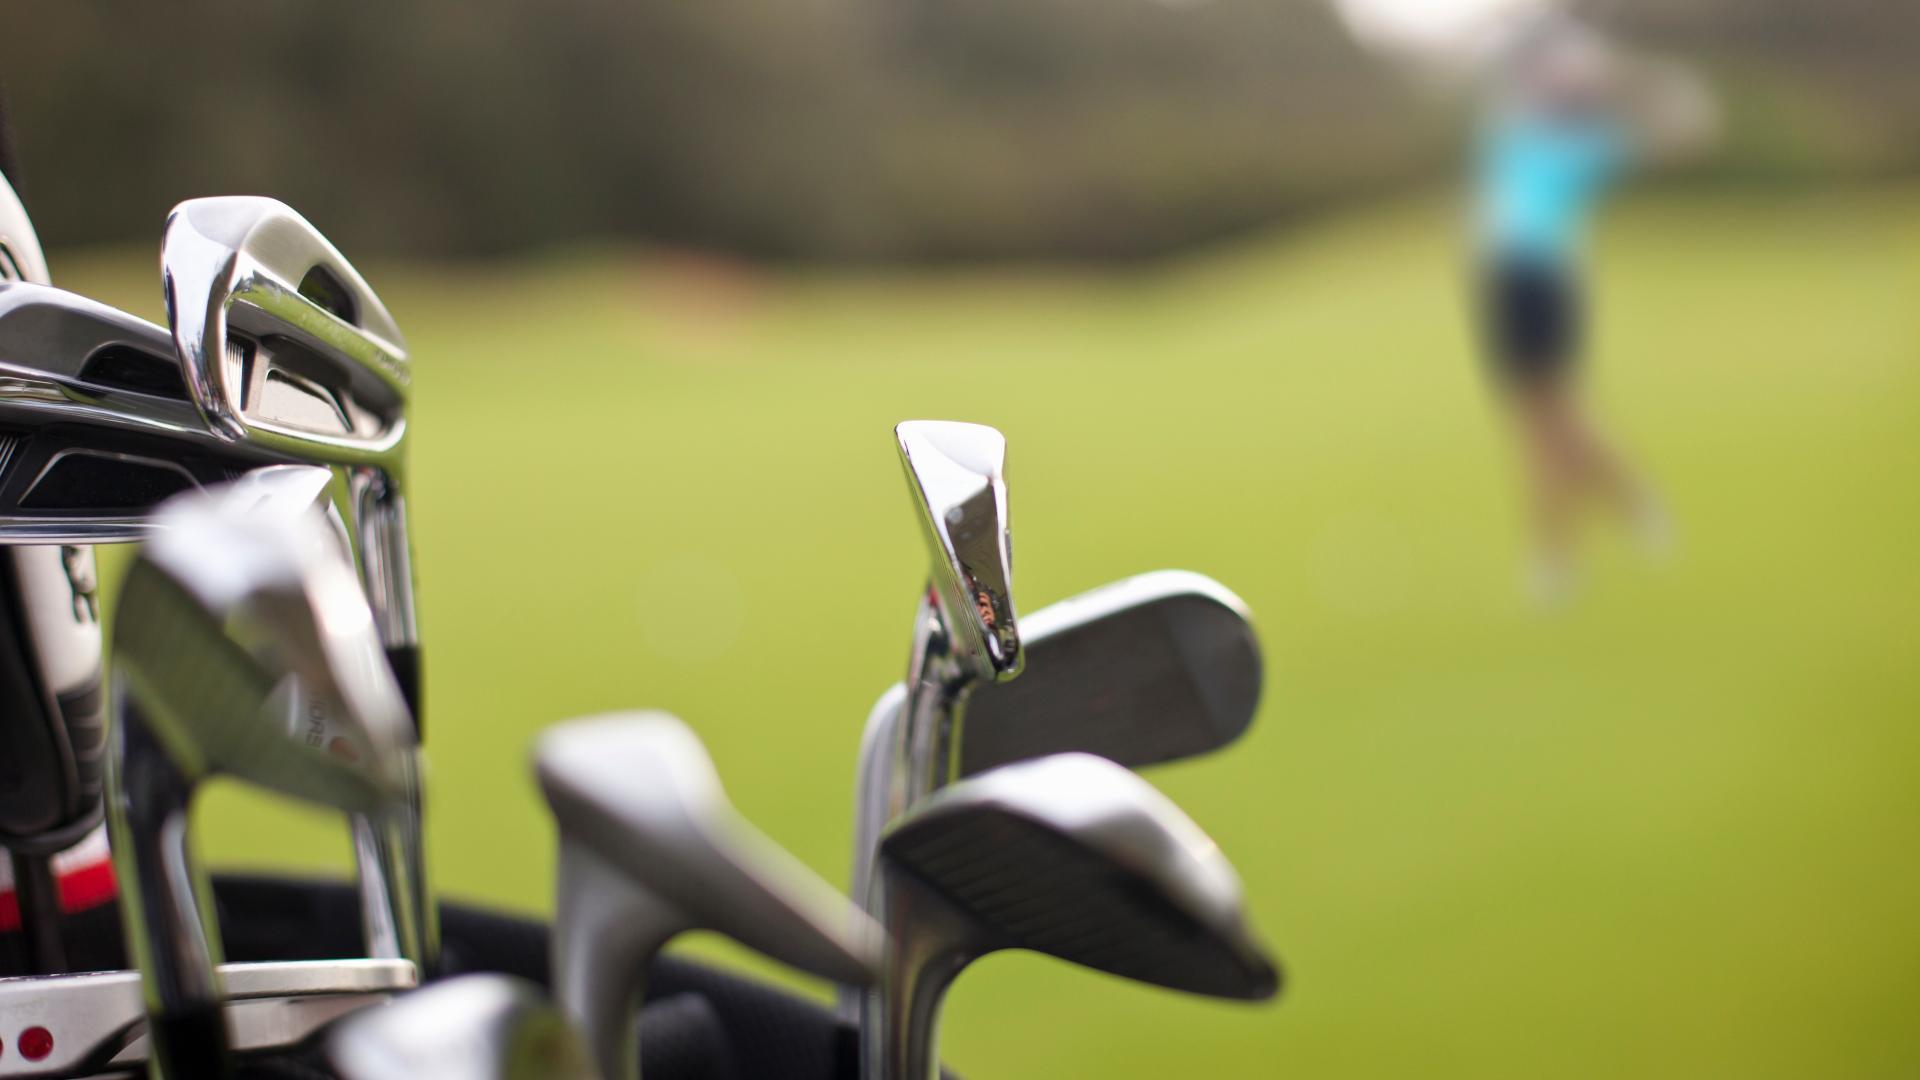 Future 18-hole Nicklaus design golf course